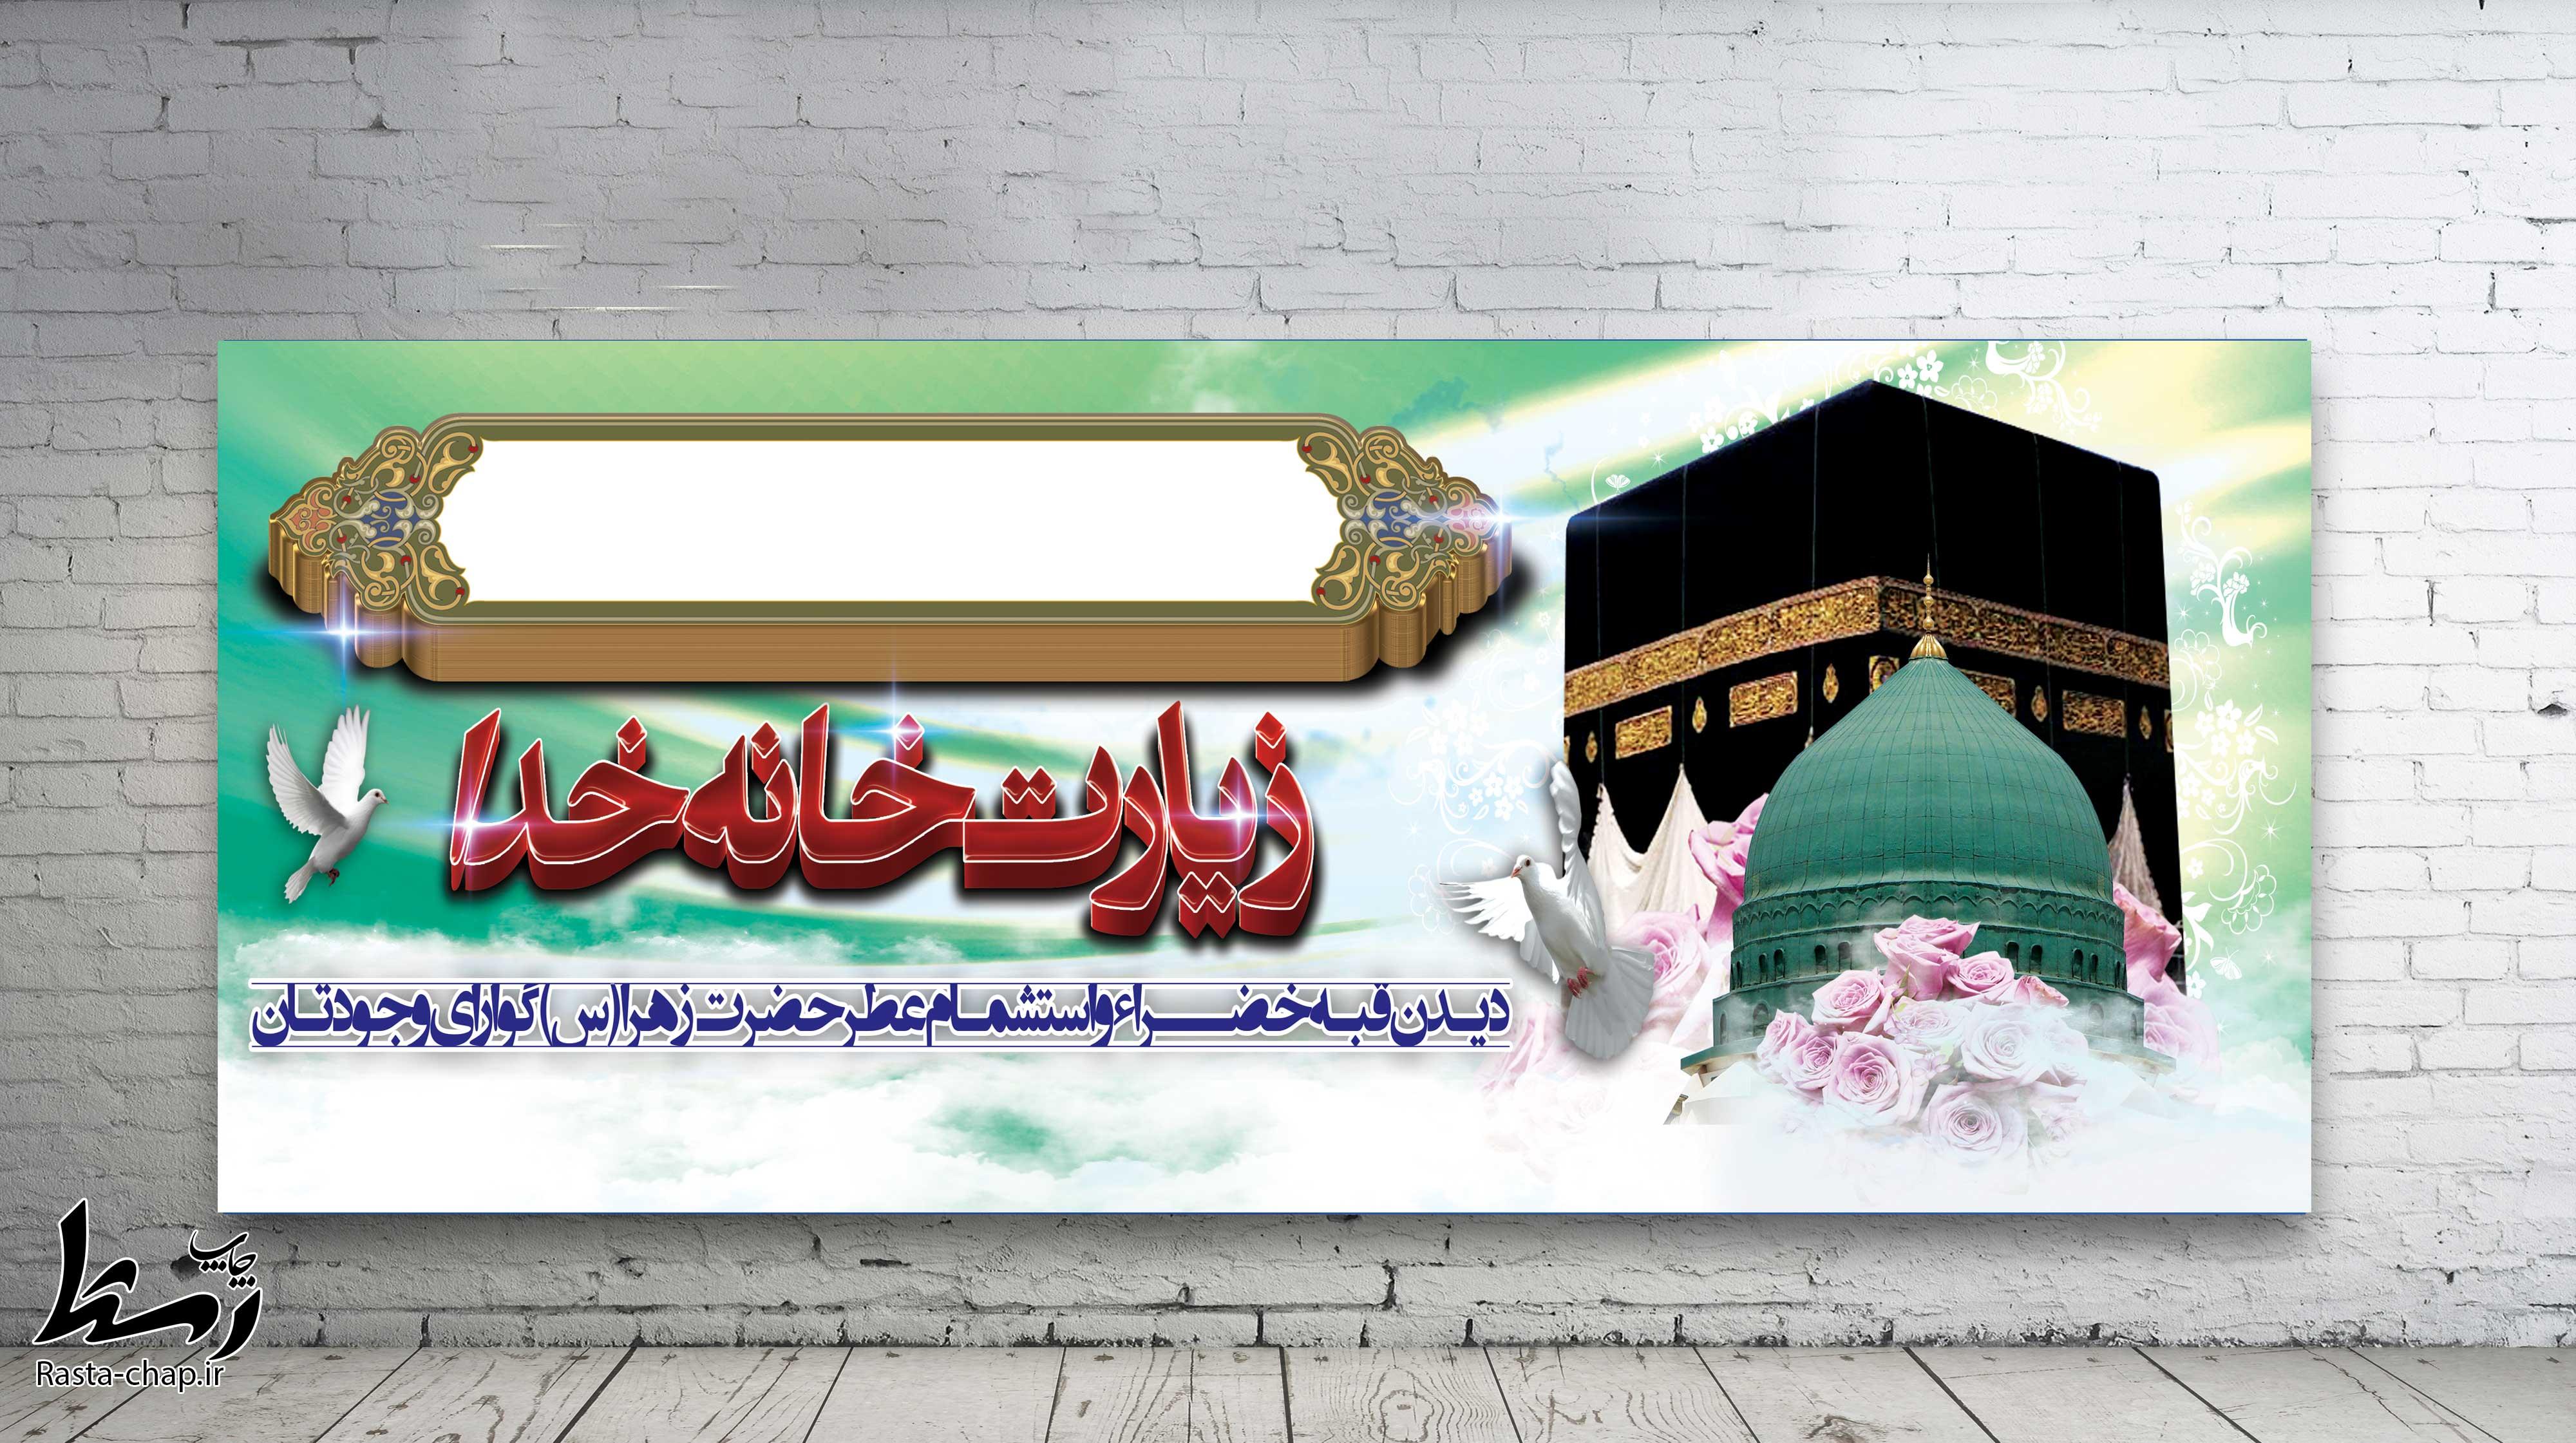 چاپ آنلاین بنر خوش آمدگوئی مکه در اسلامشهر